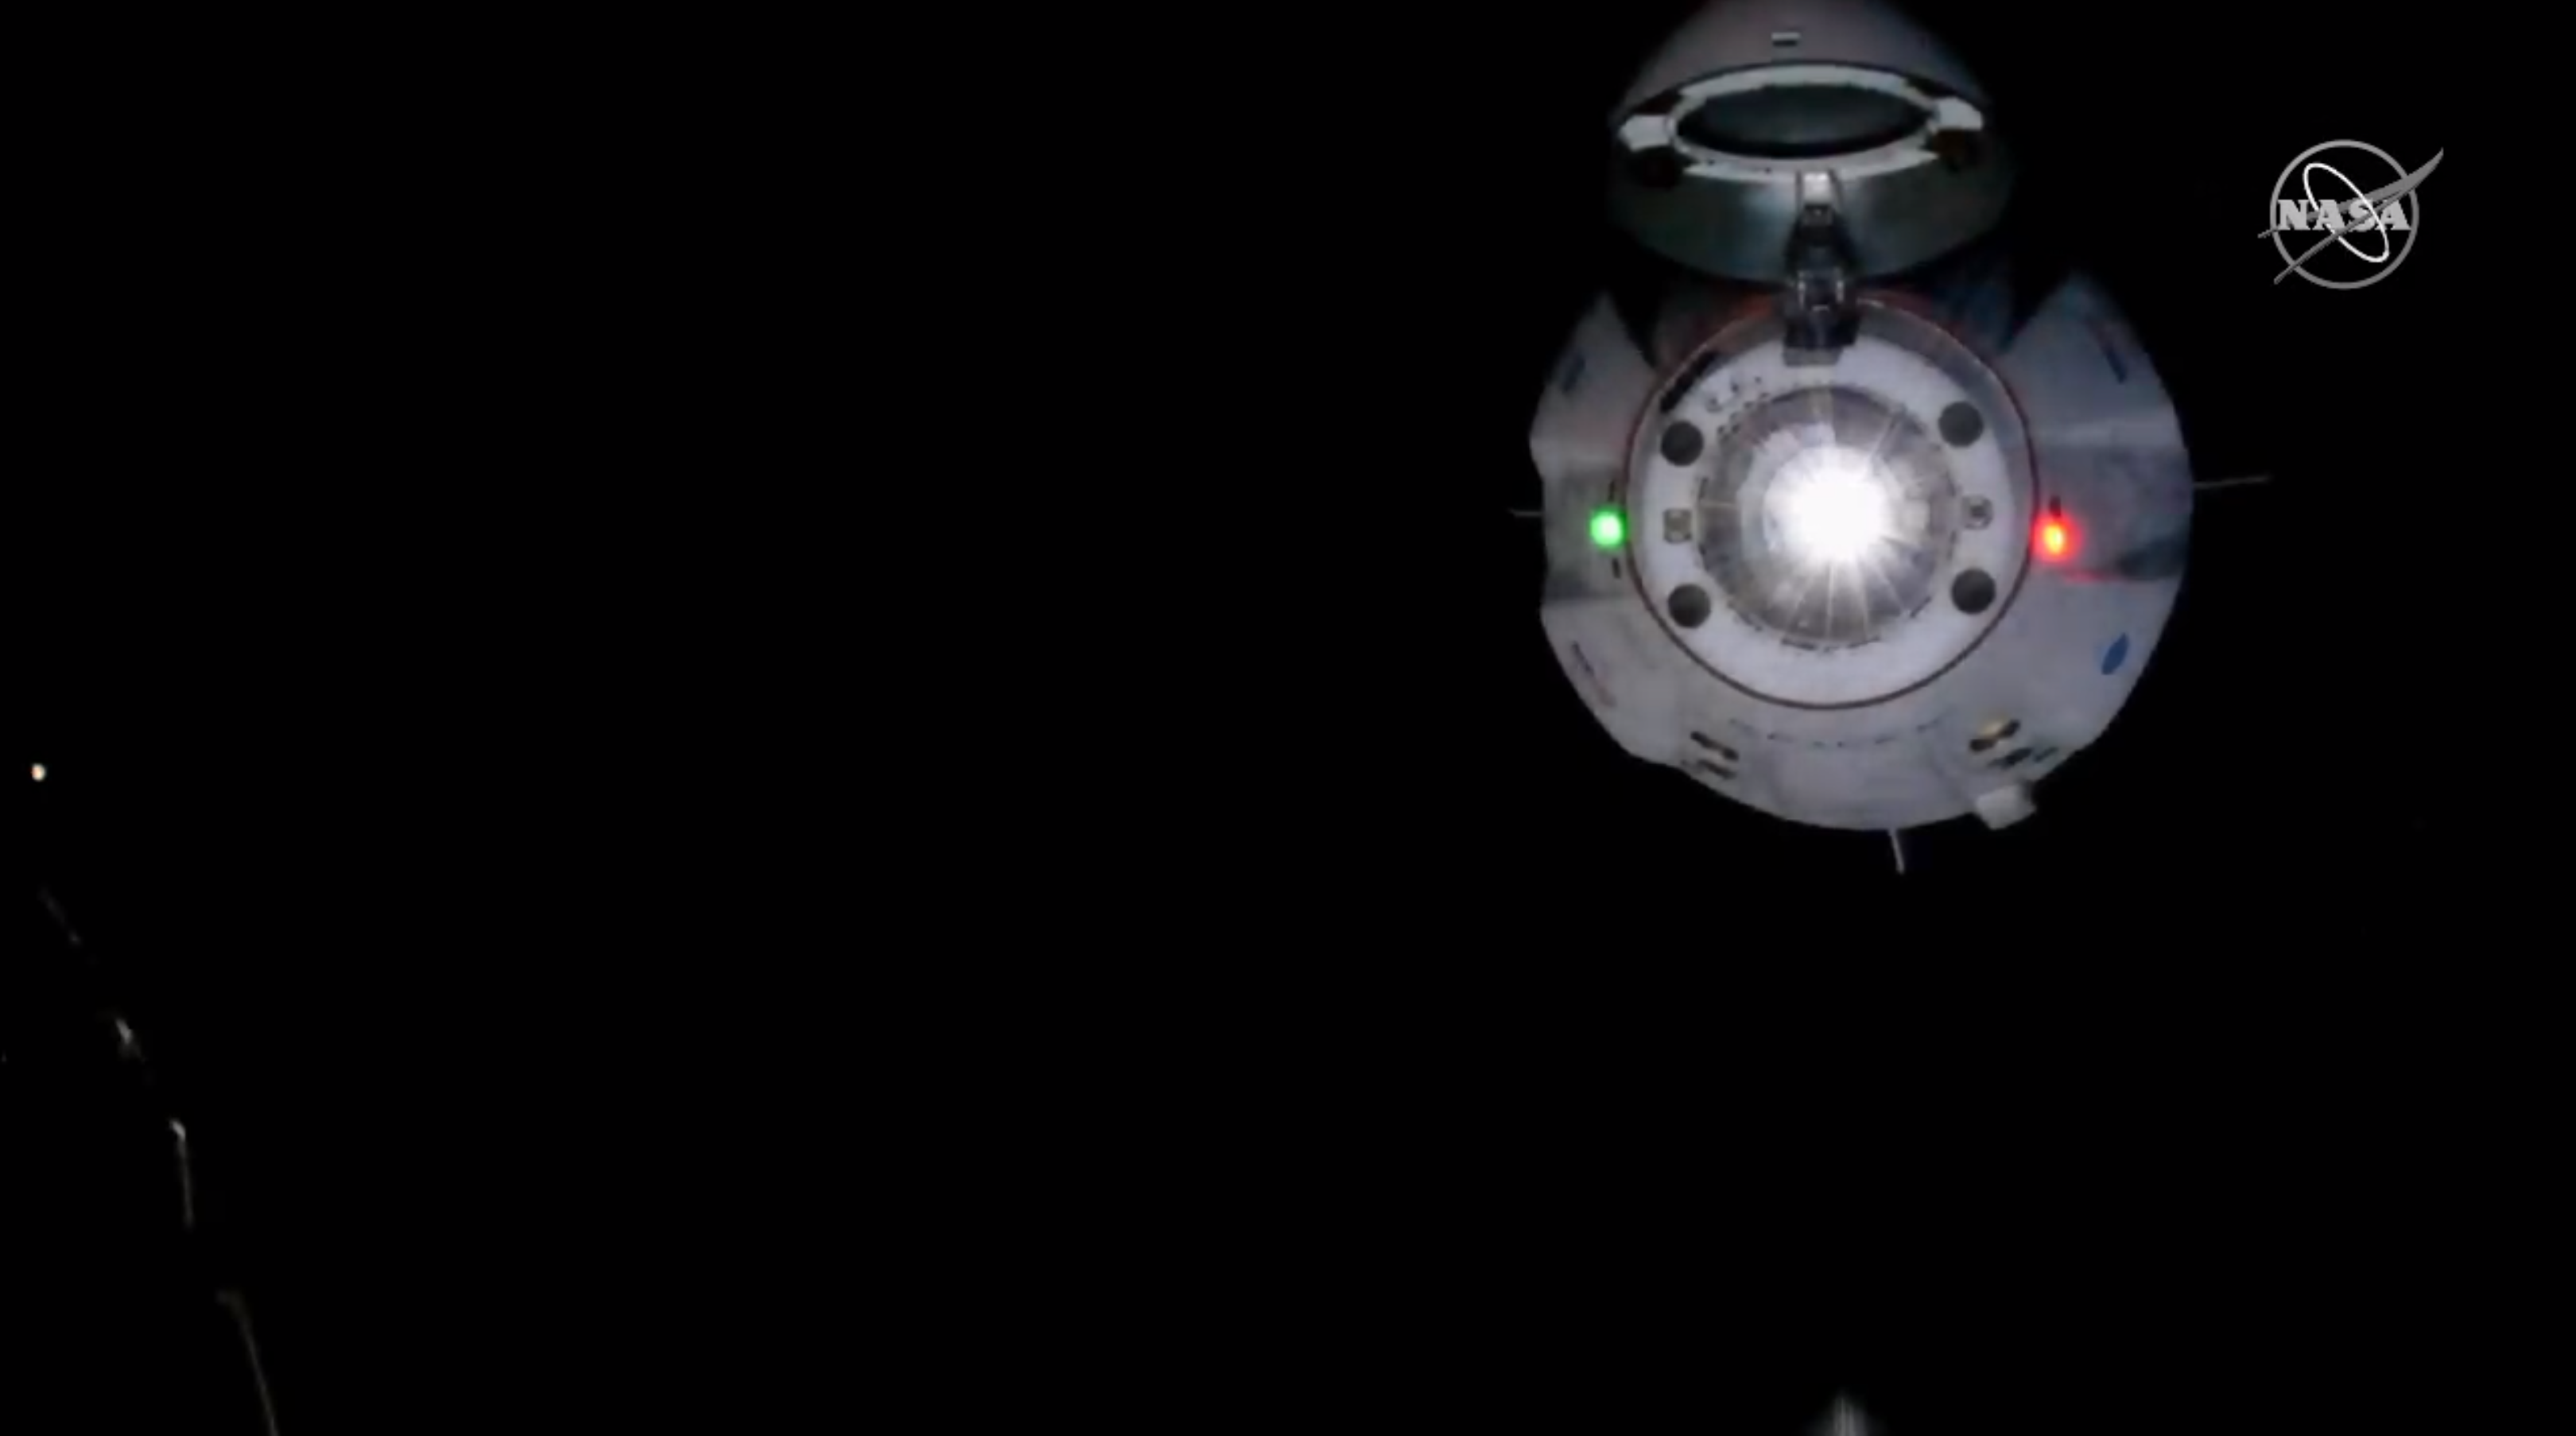 Crew Dragon DM-1 ISS arrival 030319 (NASA) 7